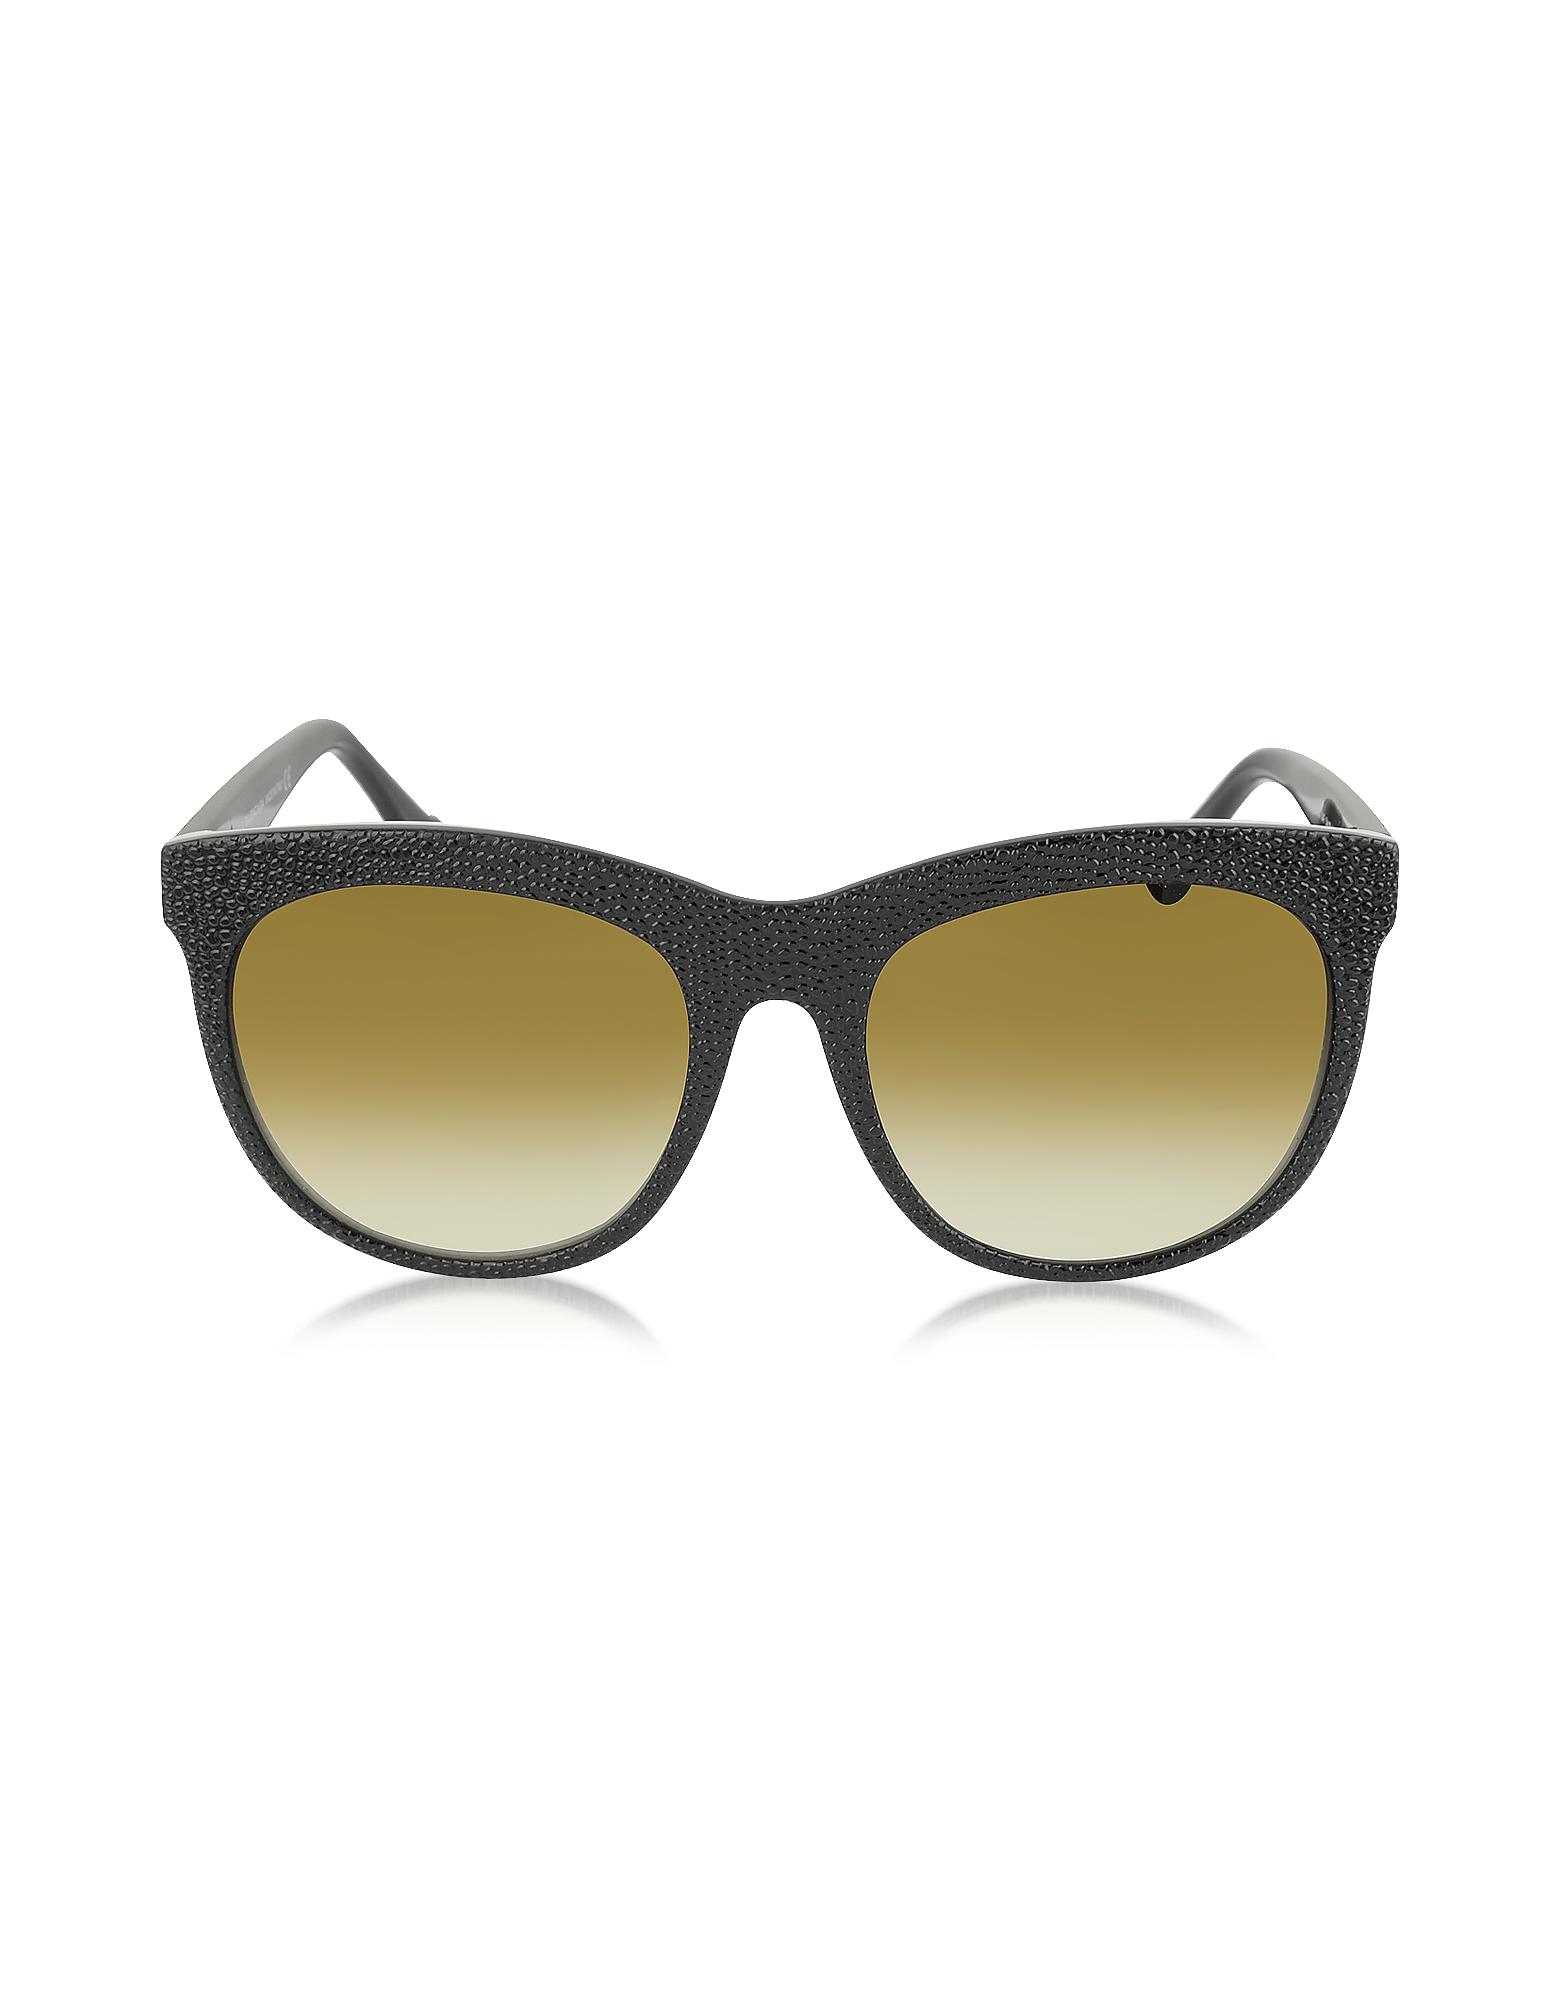 Balenciaga Designer Sunglasses, BA0024 04F Black Rubber & Acetate Cat Eye Sunglasses